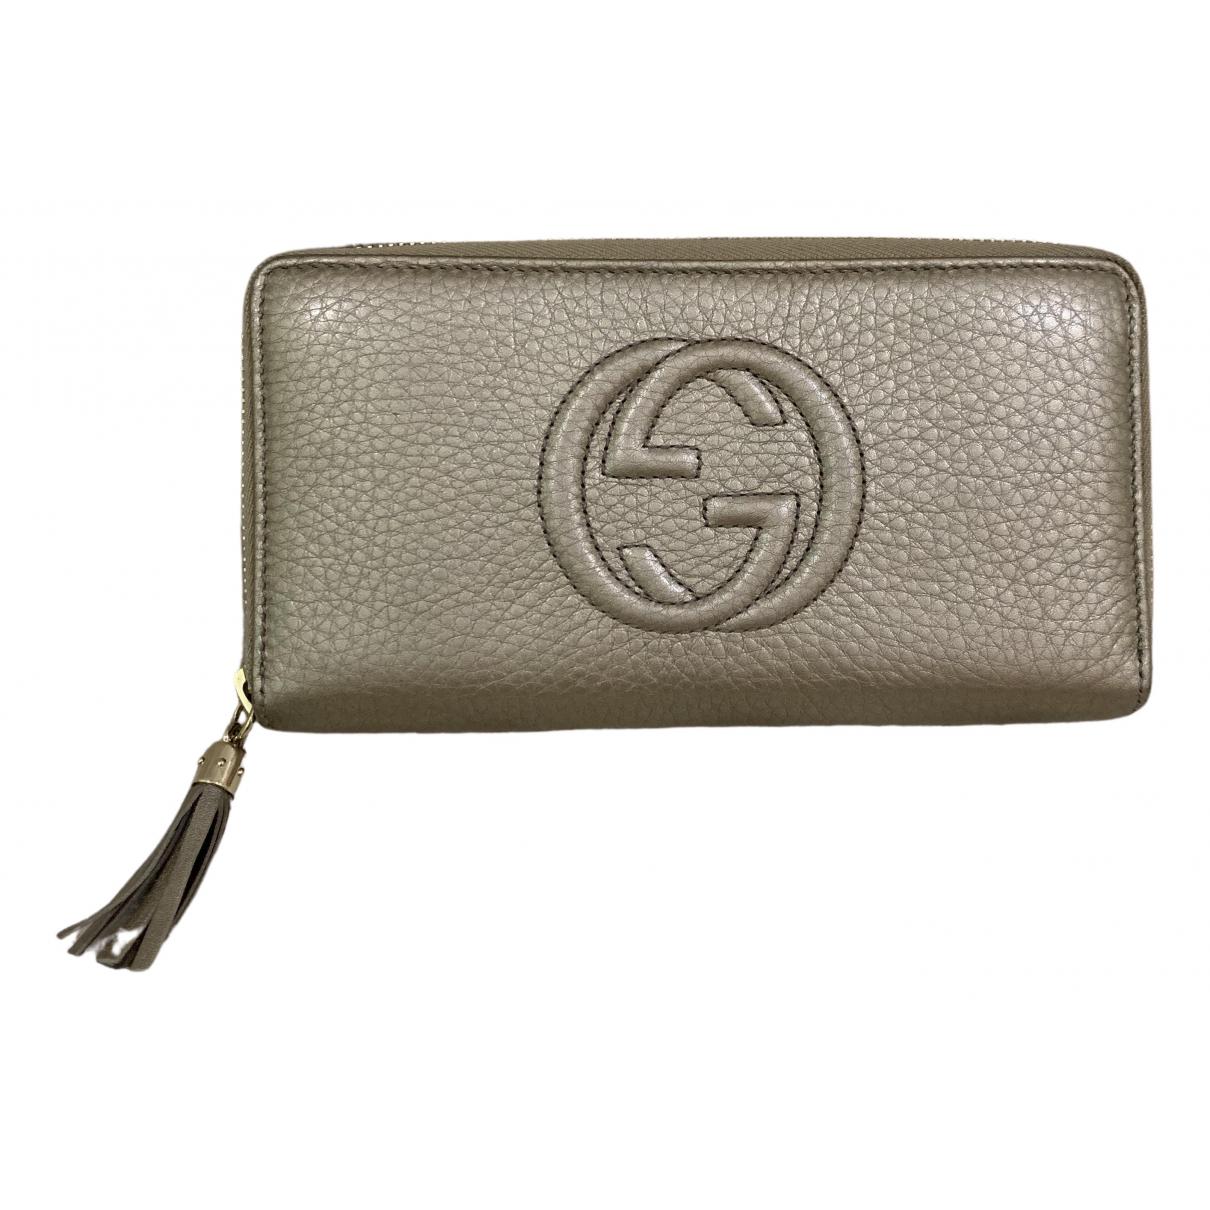 Gucci Soho Metallic Leather wallet for Women \N